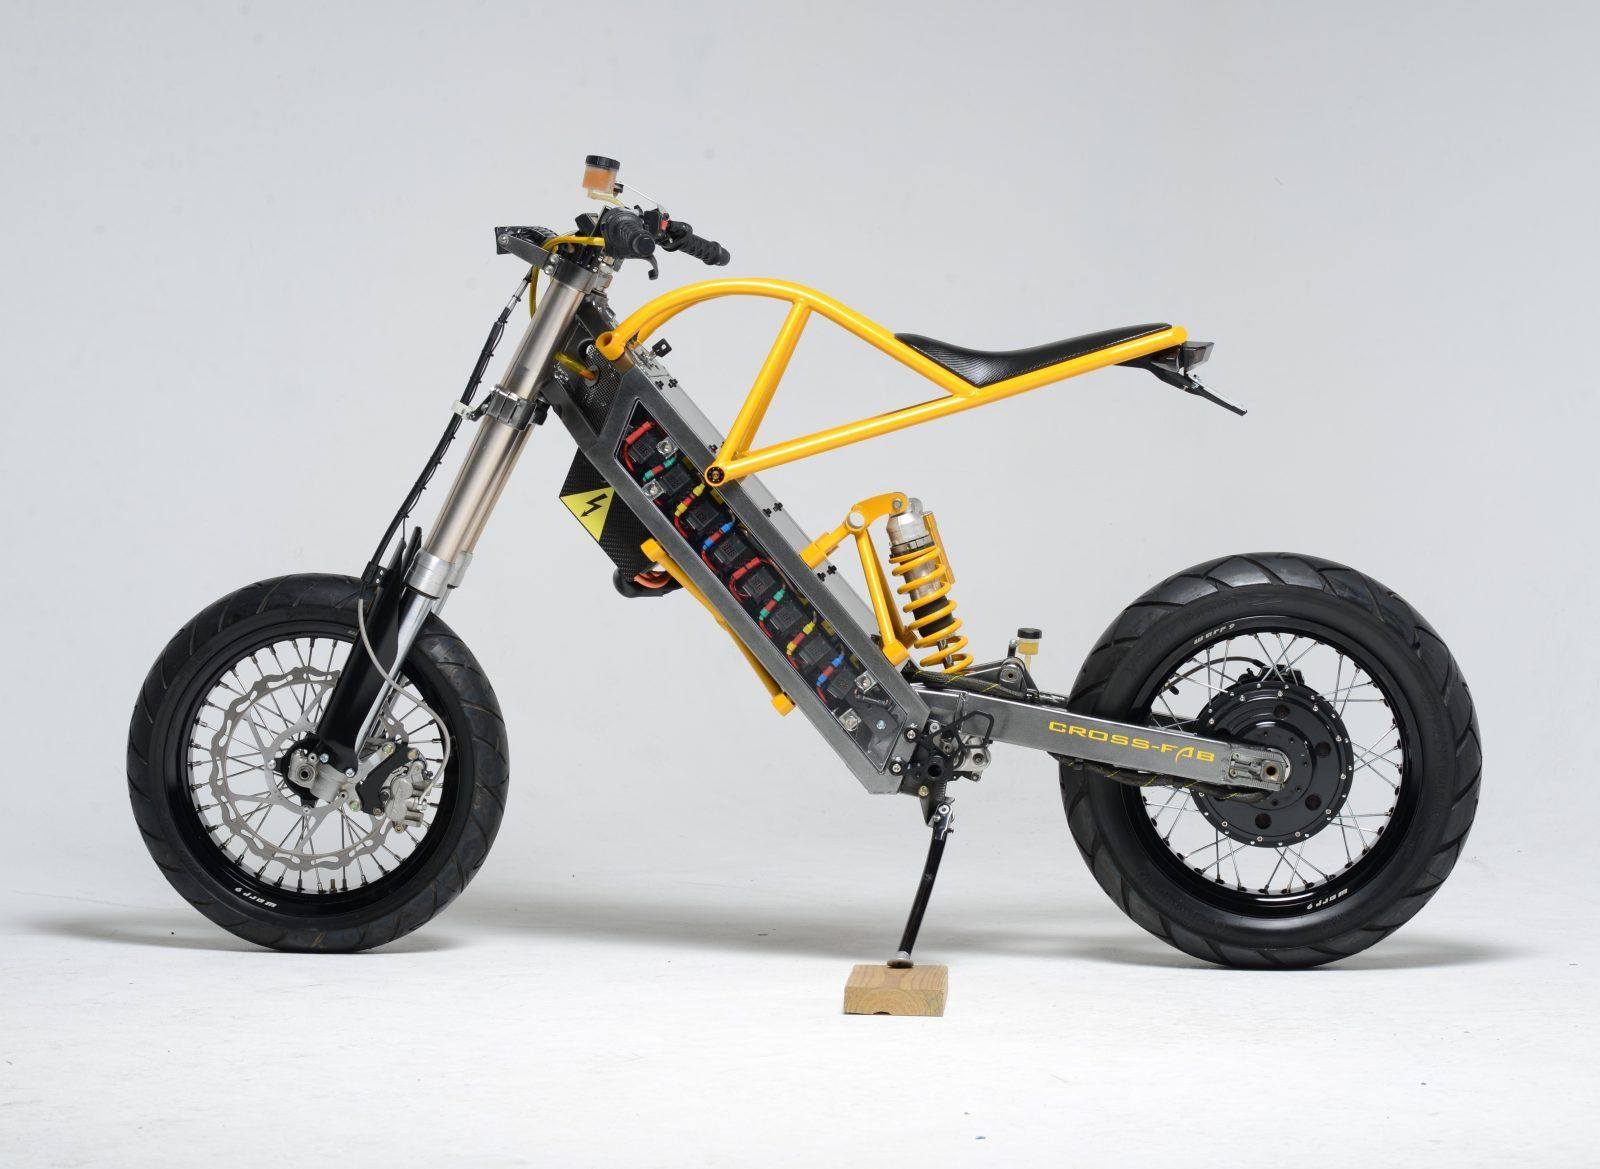 Exodyne Electric Motorcycle Elektricheskij Velosiped Velosiped